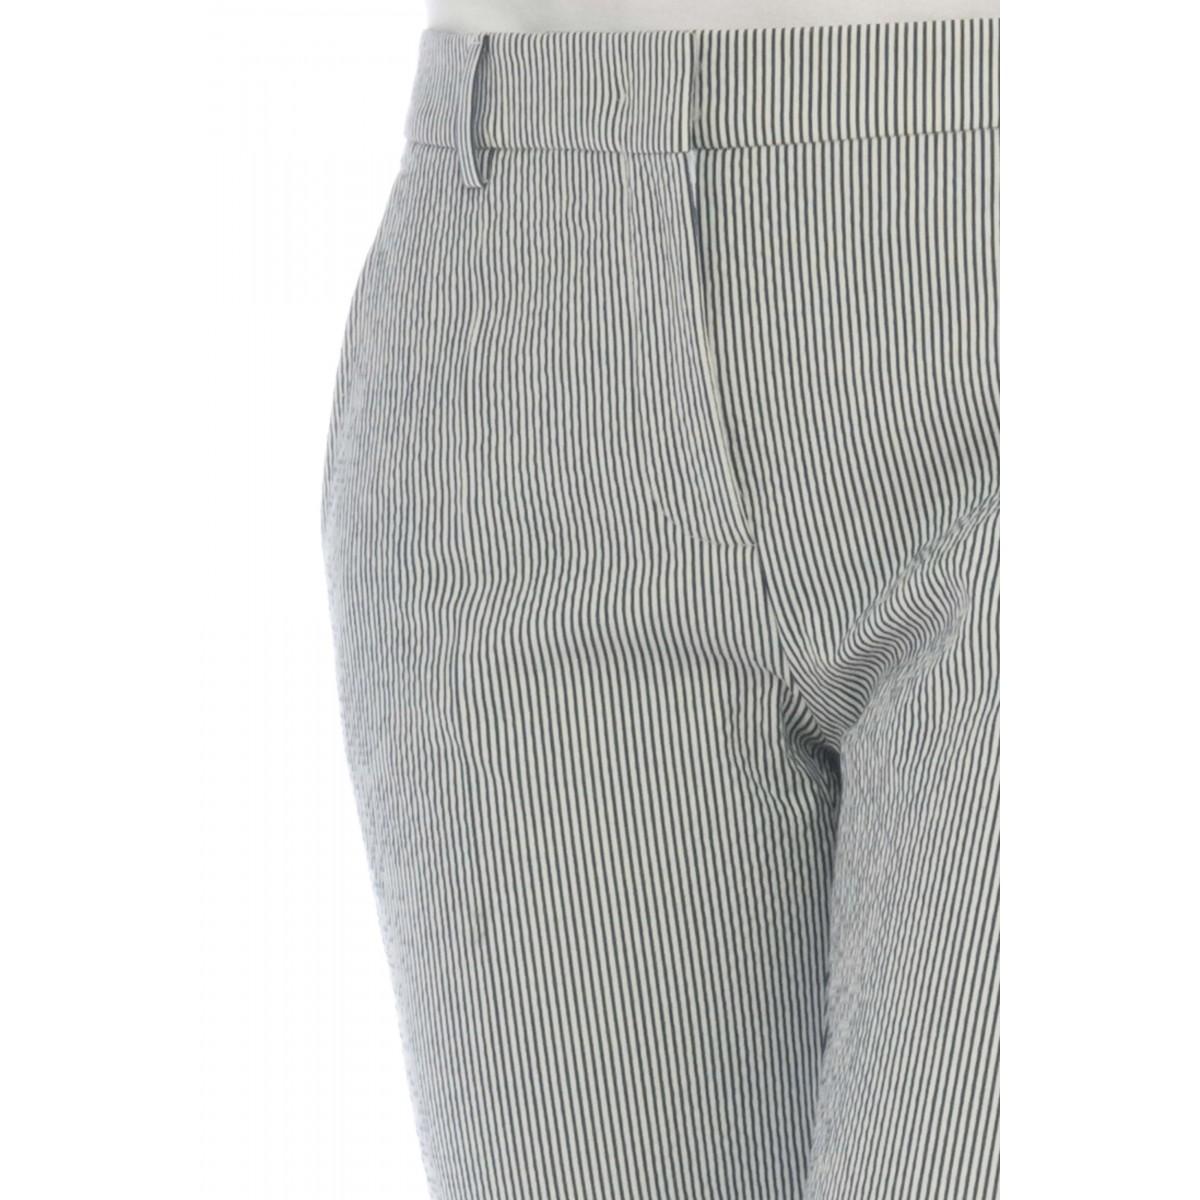 Pantalone donna - 171703 d6256 leyre slim righina